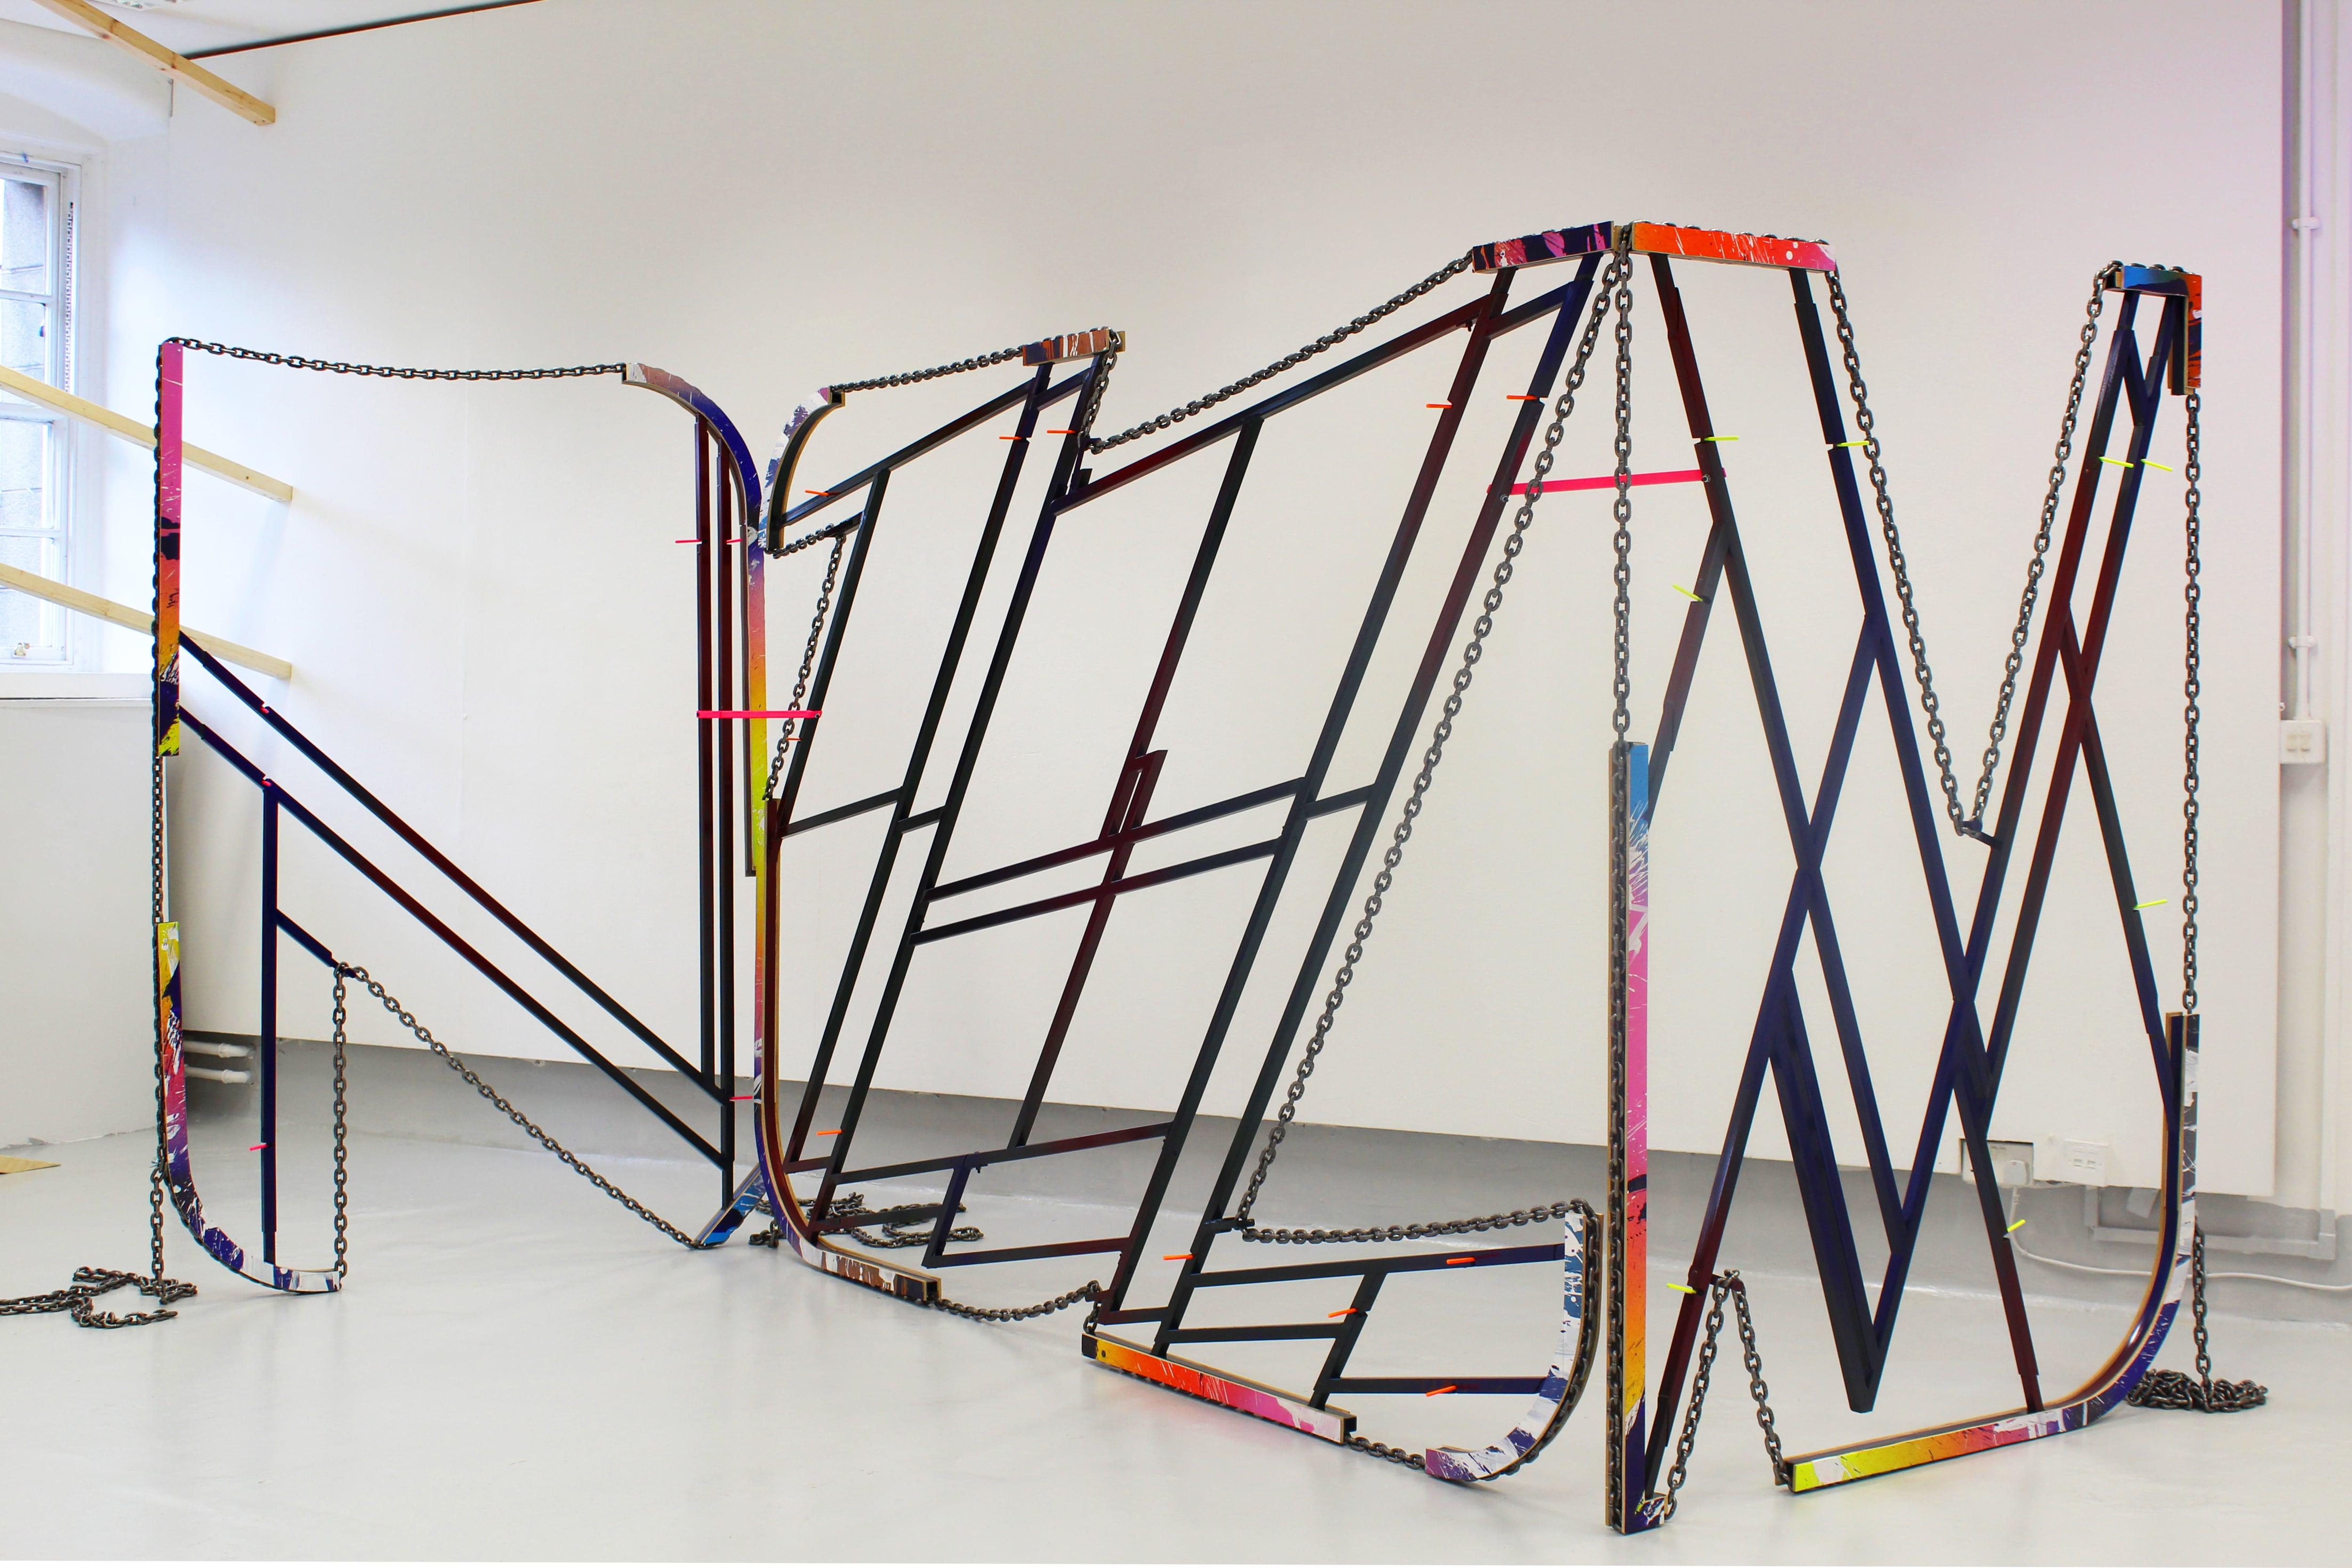 NemesM_Everyday-I-Try_2018_196x136x260cm_steel-carpaint-MDF-acrylic-lifting-chain-min